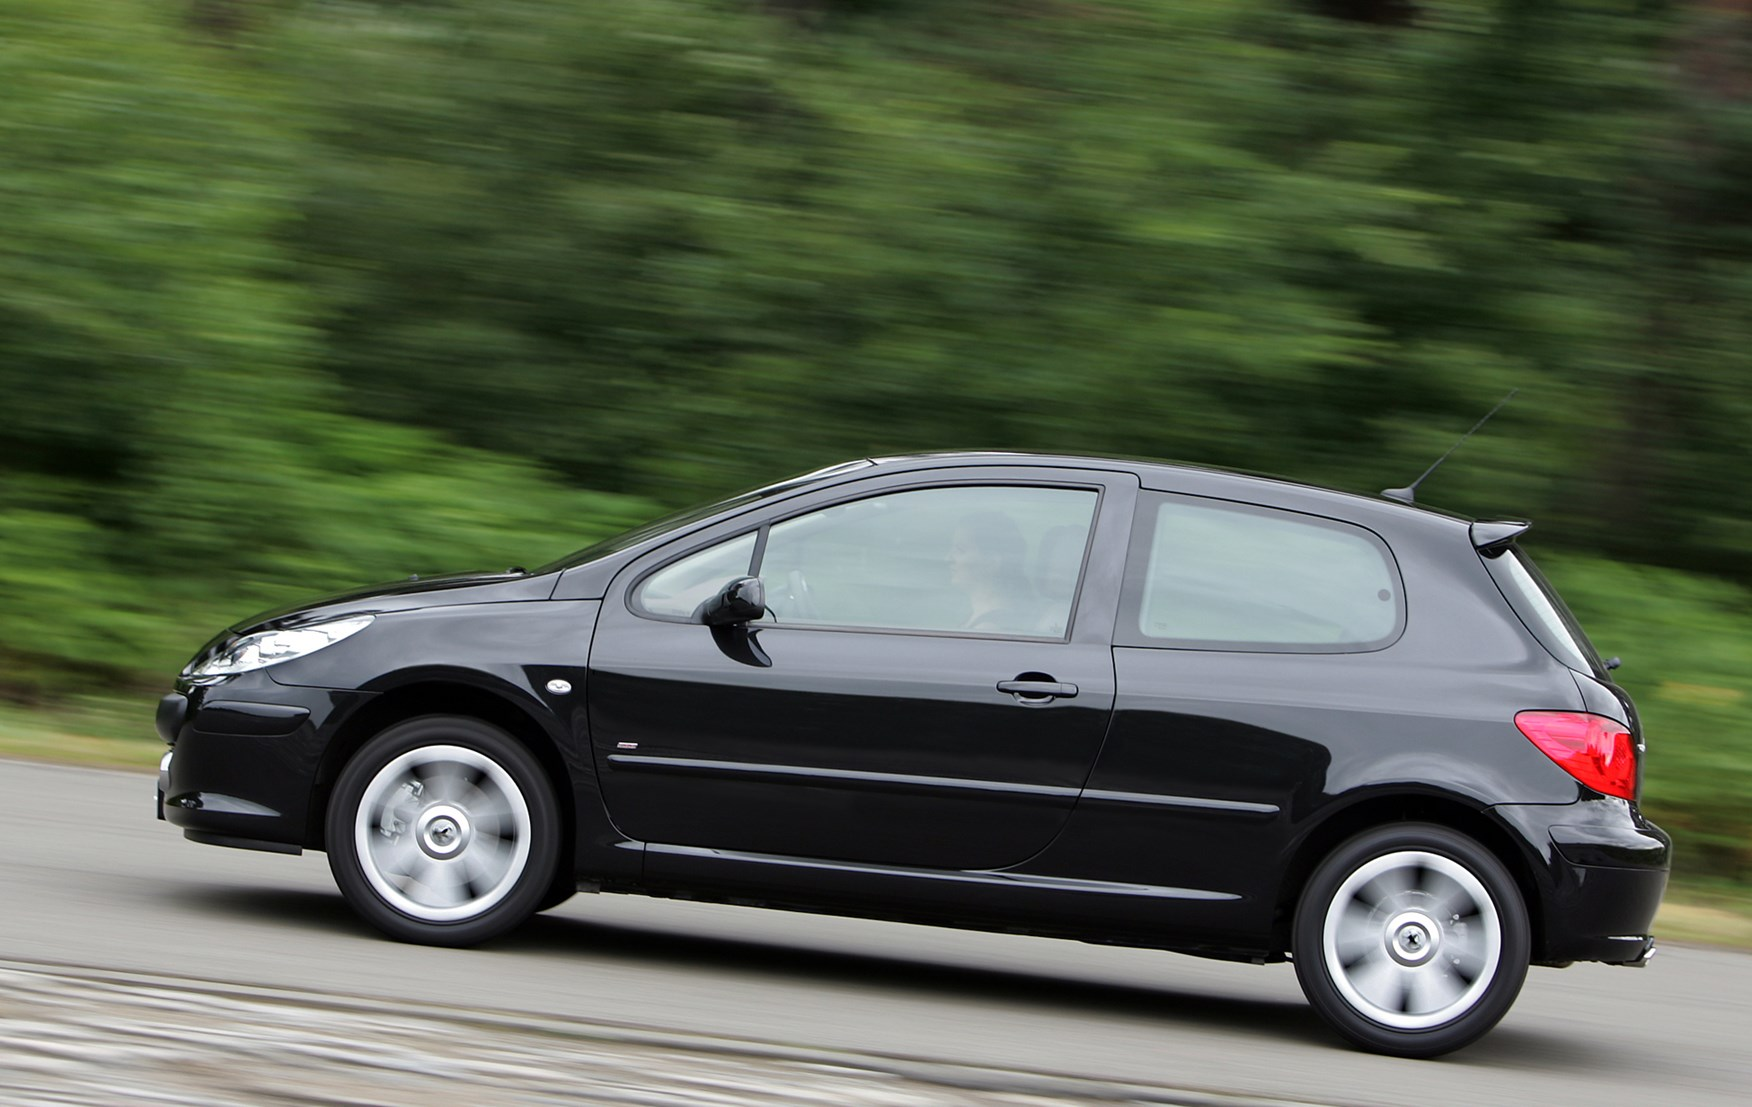 Peugeot 307 Hatchback Review (2001 - 2007) | Parkers